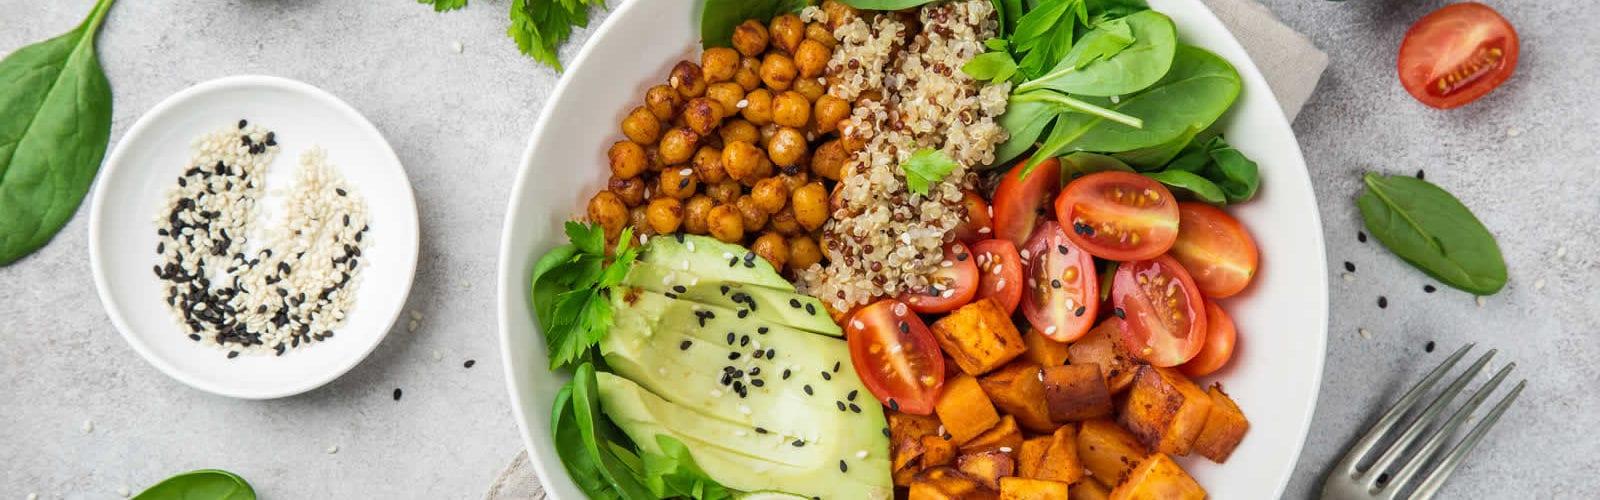 etre-vegan-sante-sain-restaurants-adresses-atlanta-une